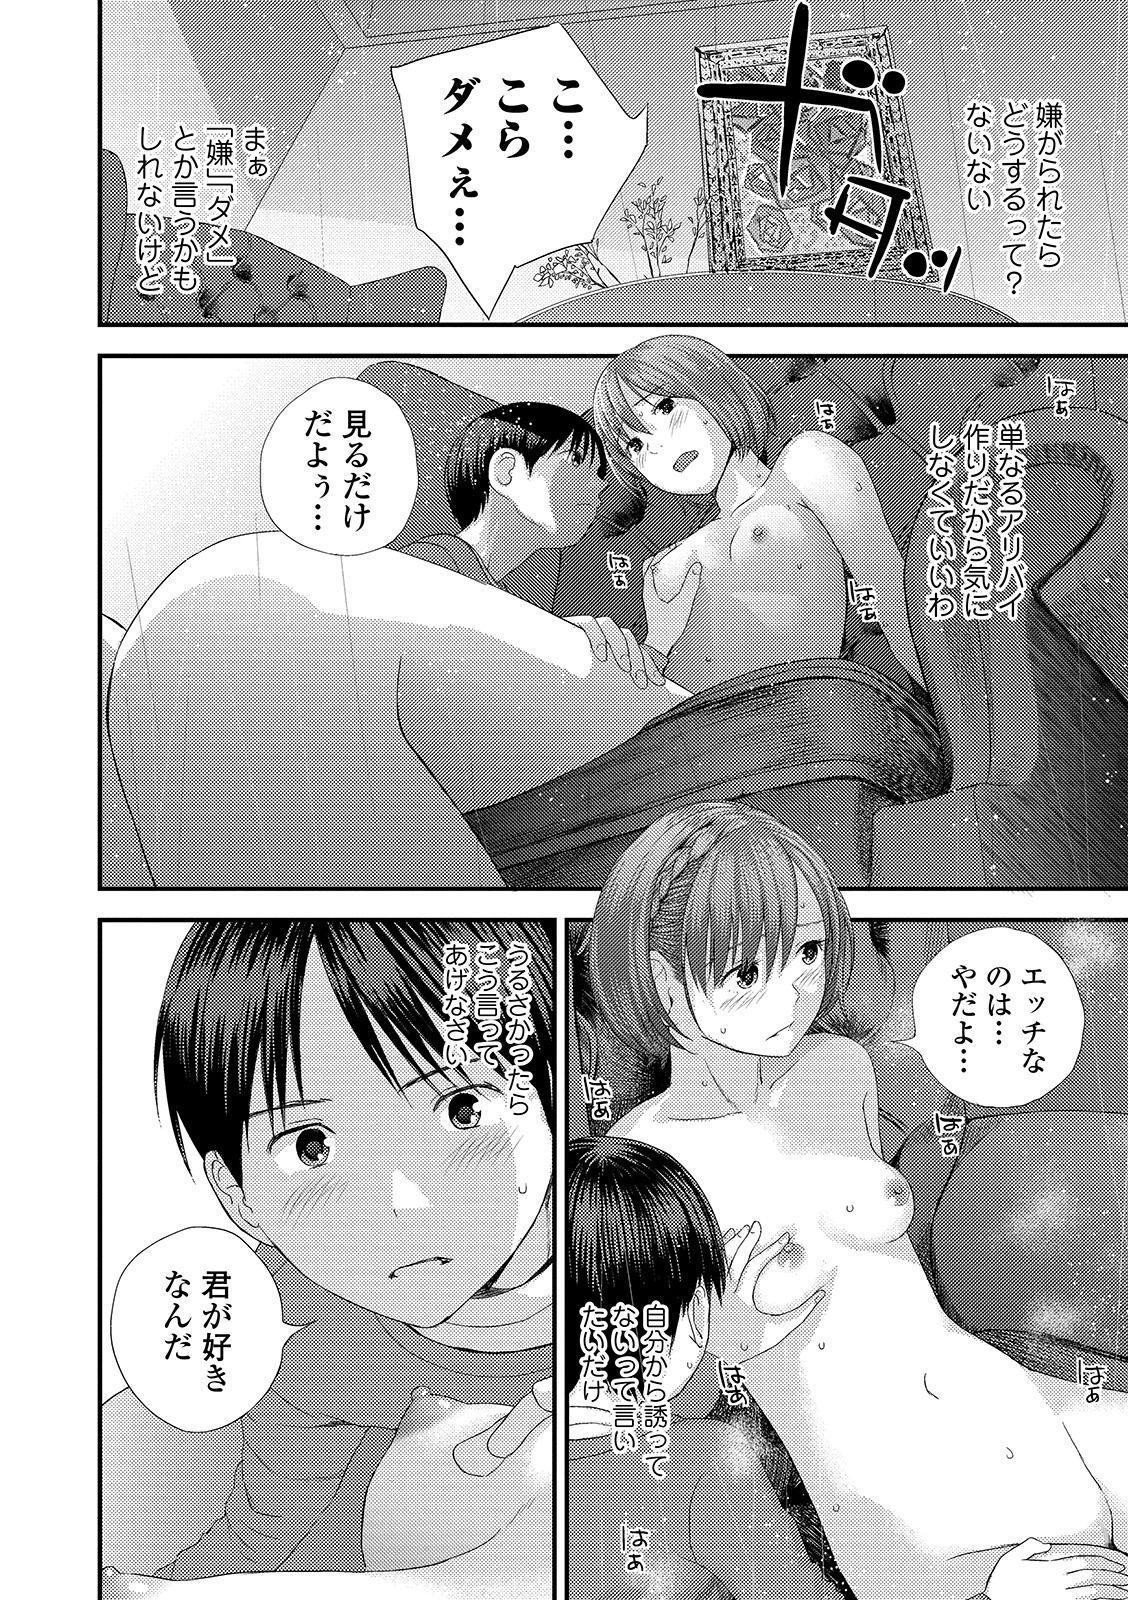 COMIC Shigekiteki SQUIRT!! Vol. 15 117